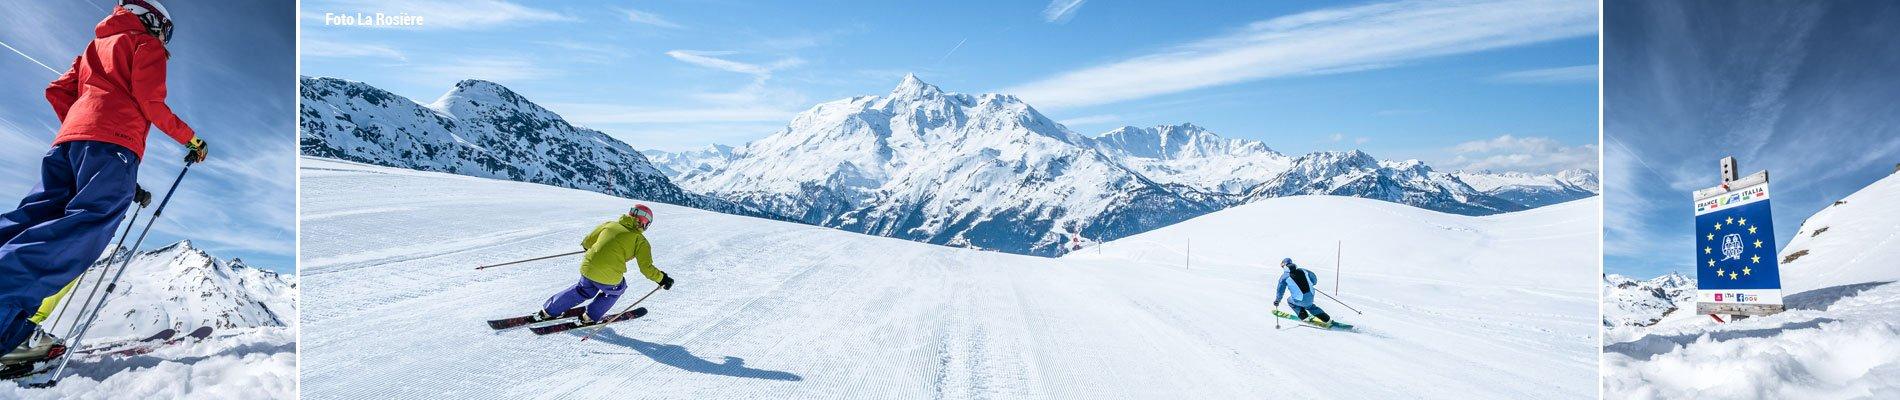 les-balcons-de-la-rosiere-ski-6-1900x400.jpg